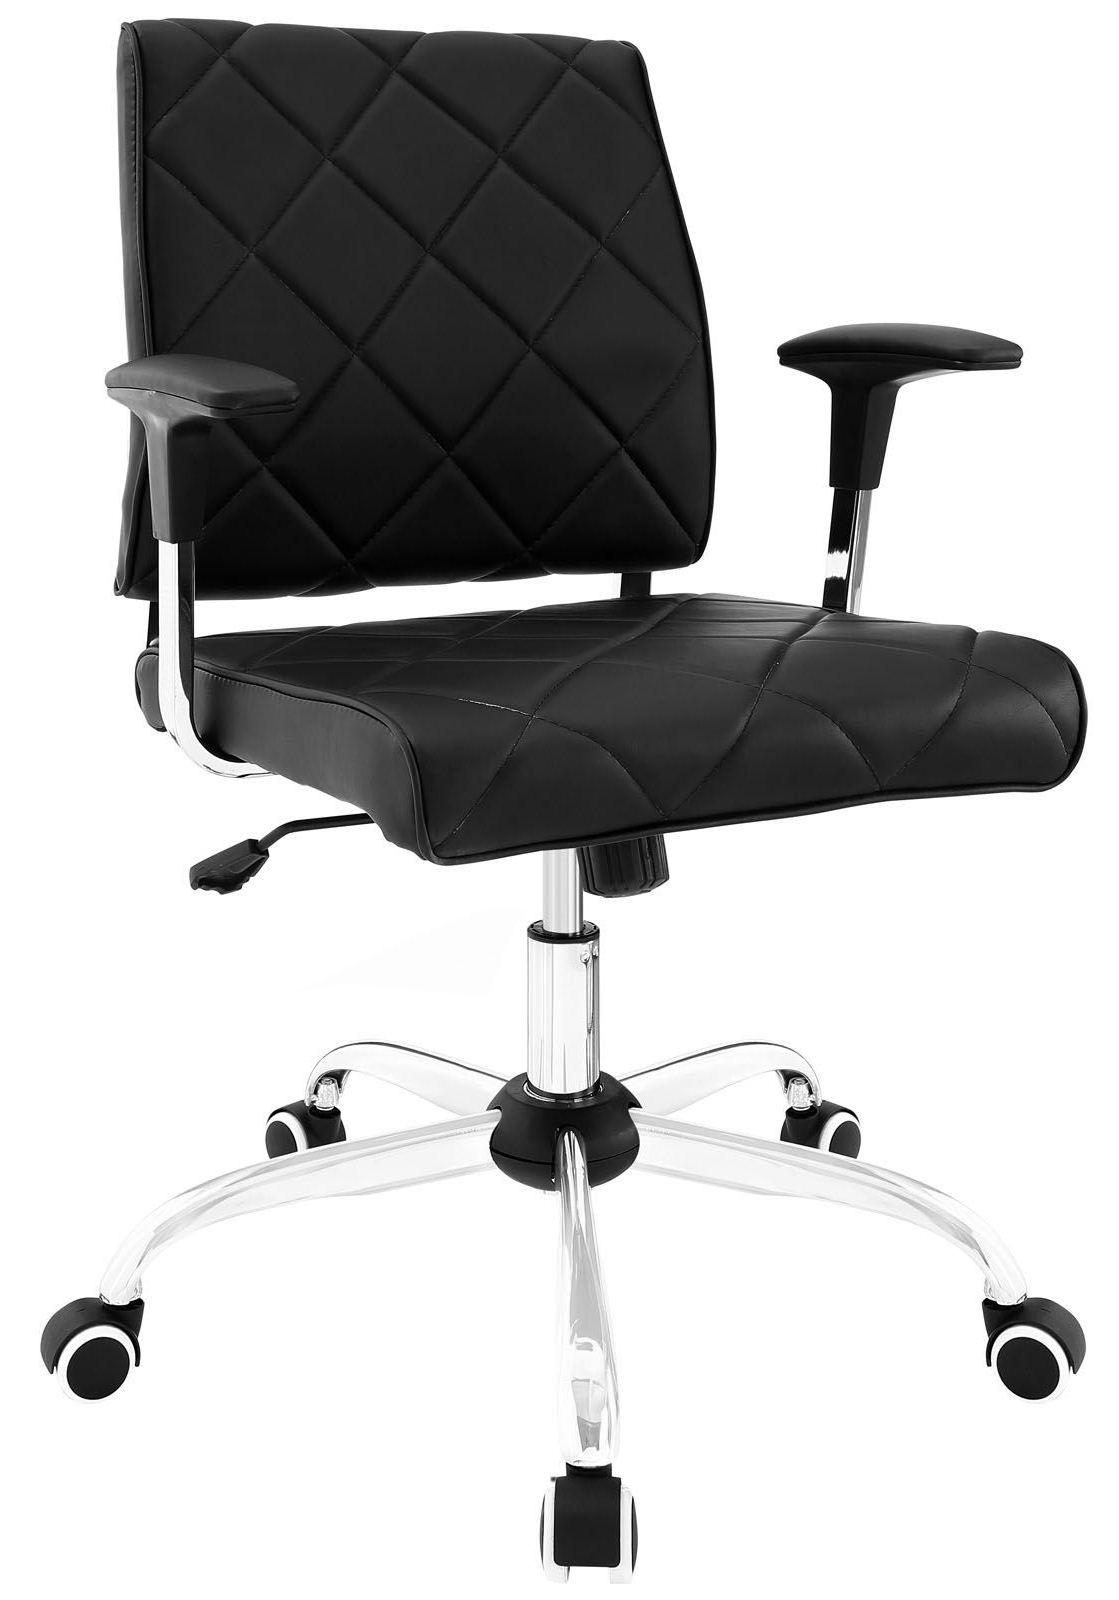 office chair vinyl seat protector lattice black from renegade eei 1247